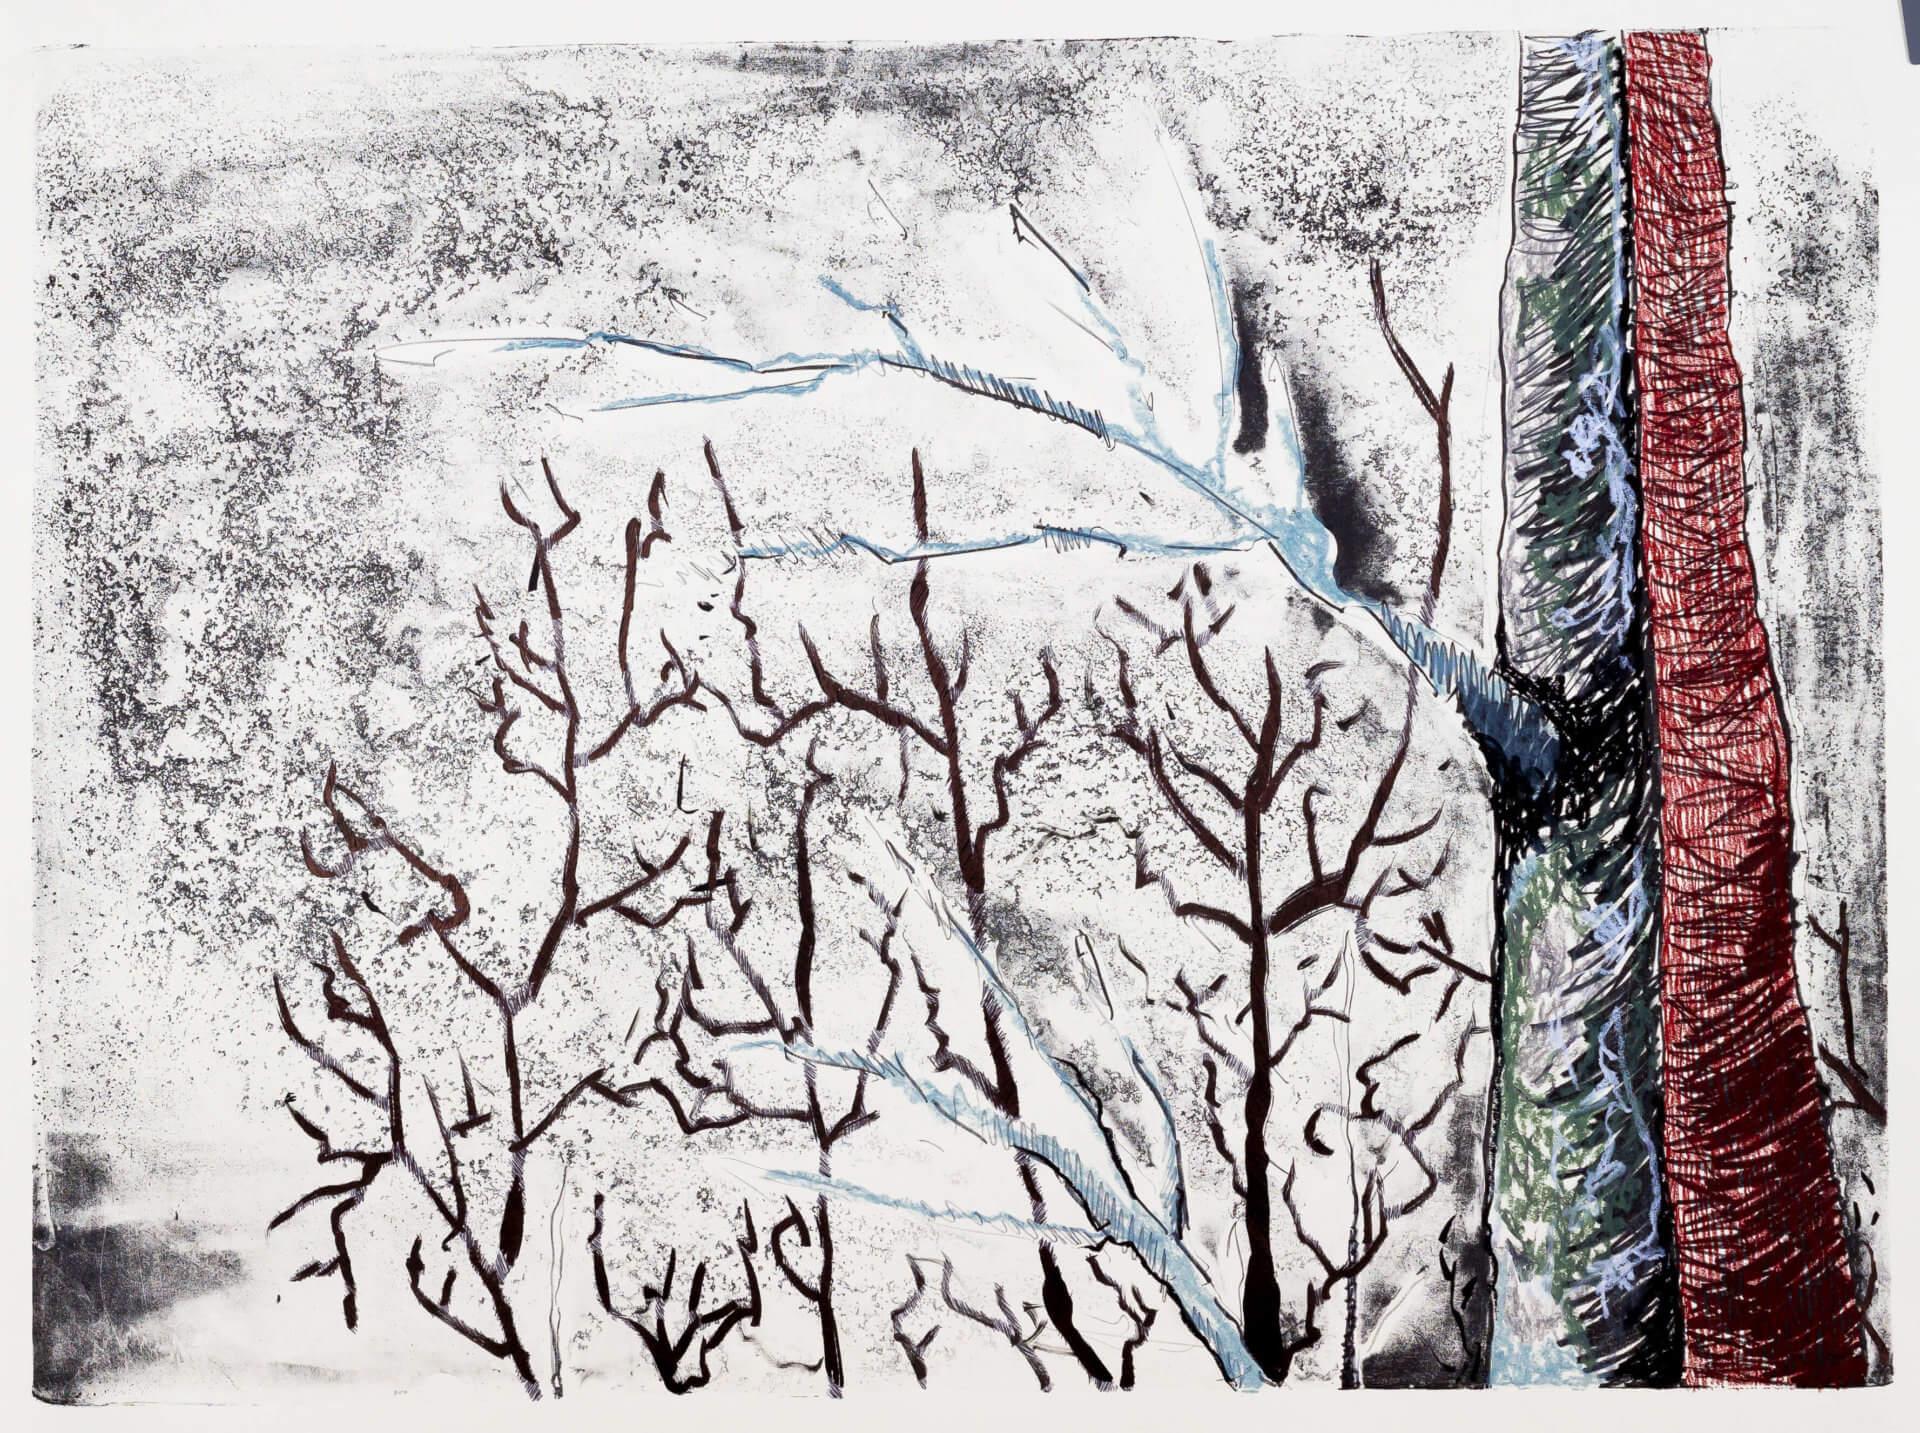 Katharina Albers, Wald (F_B)(G), 2016, Lithographie handkoloriert (Ölkreide, Graphit, Aquarellfarbe, Fineliner, Gelstift, Tusche), Unikat, 70×100 cm